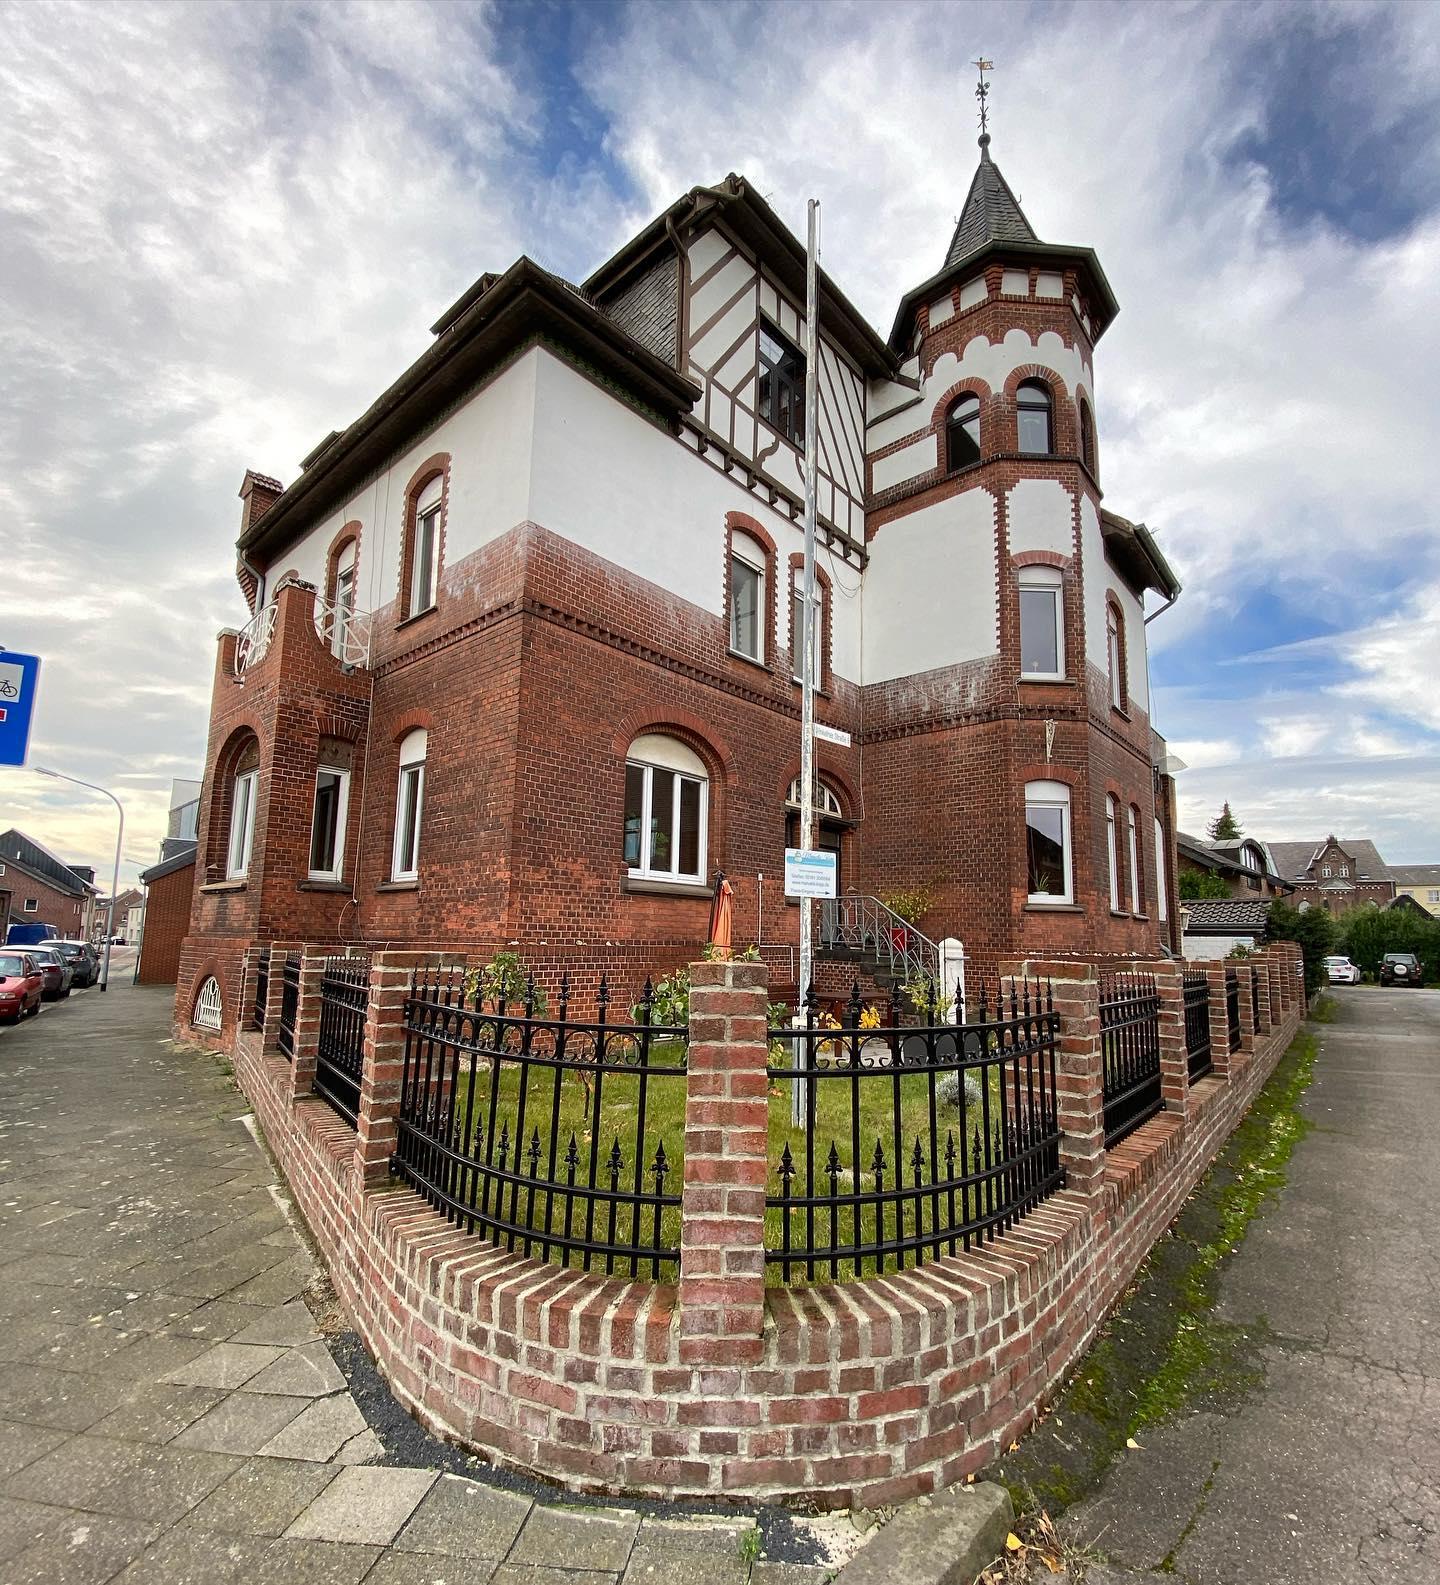 Runde Ecke -  #mönchengladbach